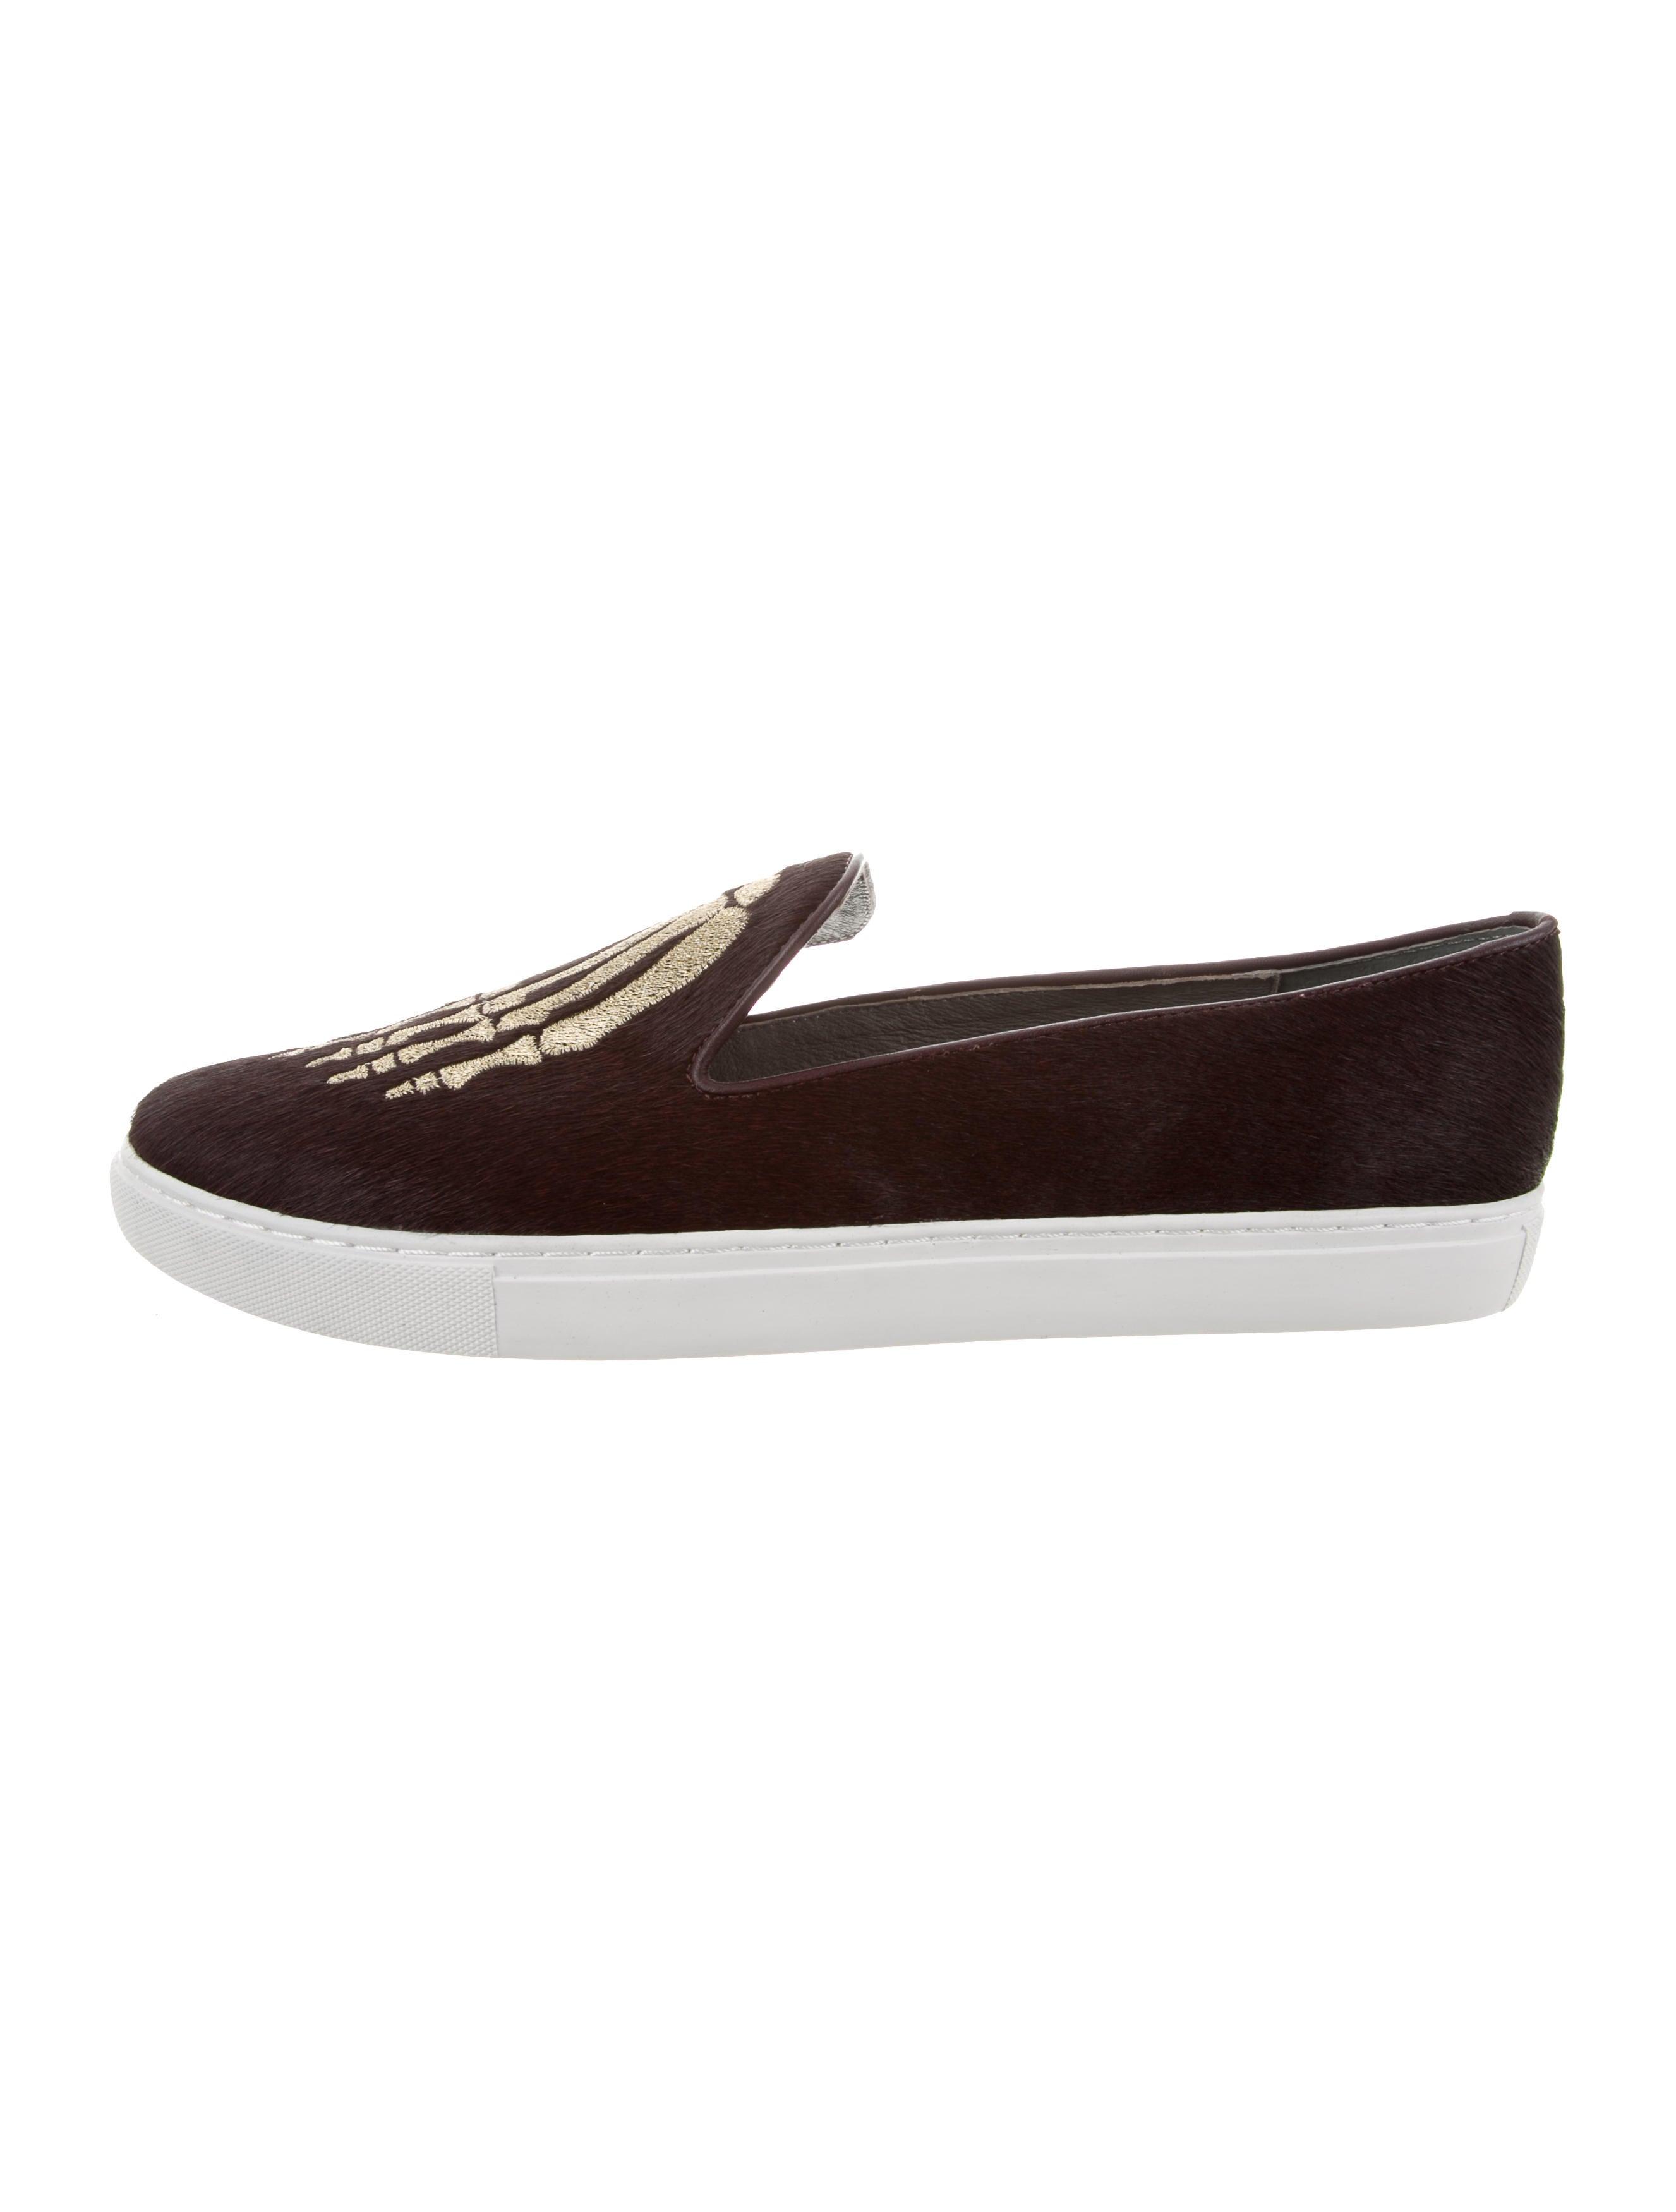 Mara & Mine Jem Ponyhair Sneakers w/ Tags outlet online online for sale free shipping cost 1wWeMEKRt